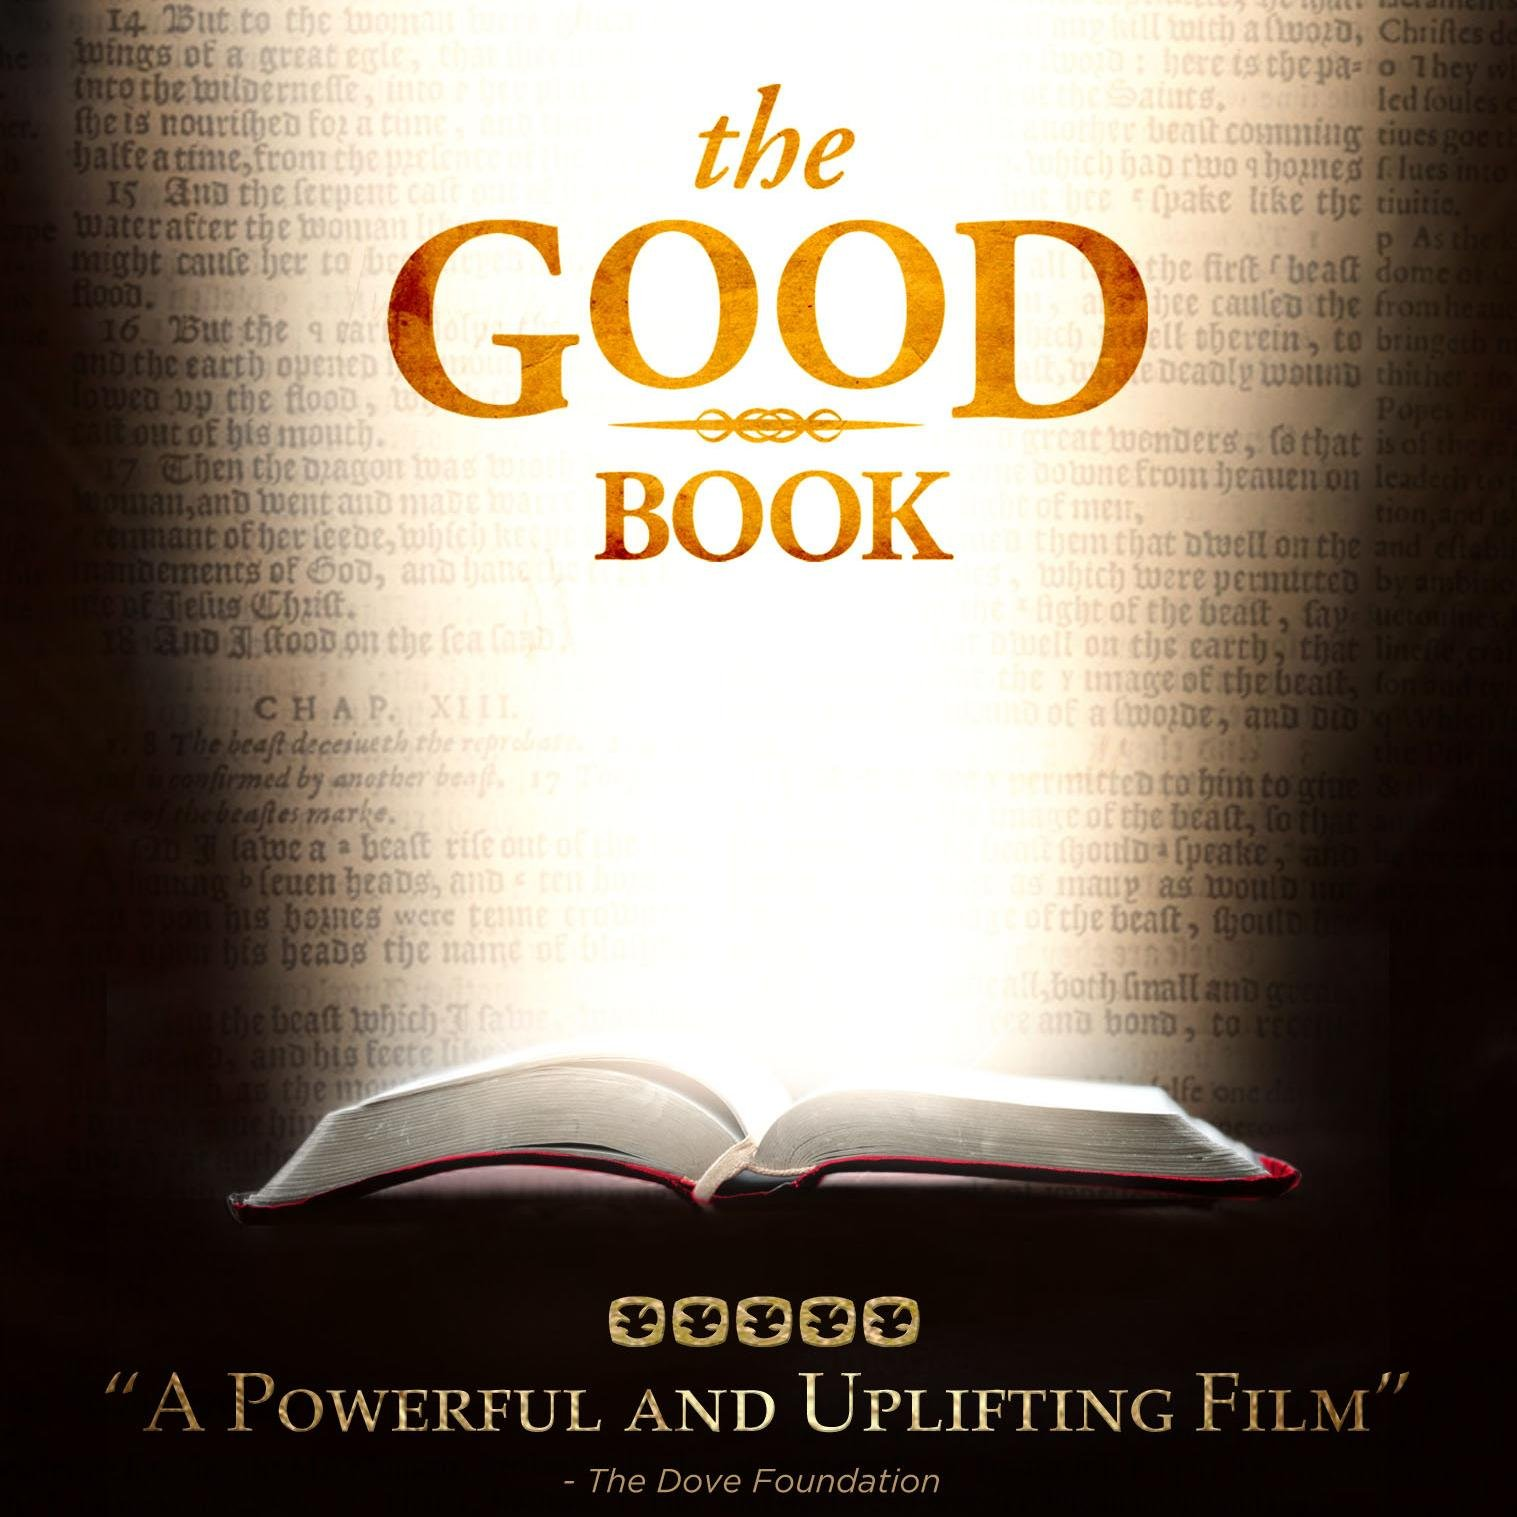 The Good Book Movie